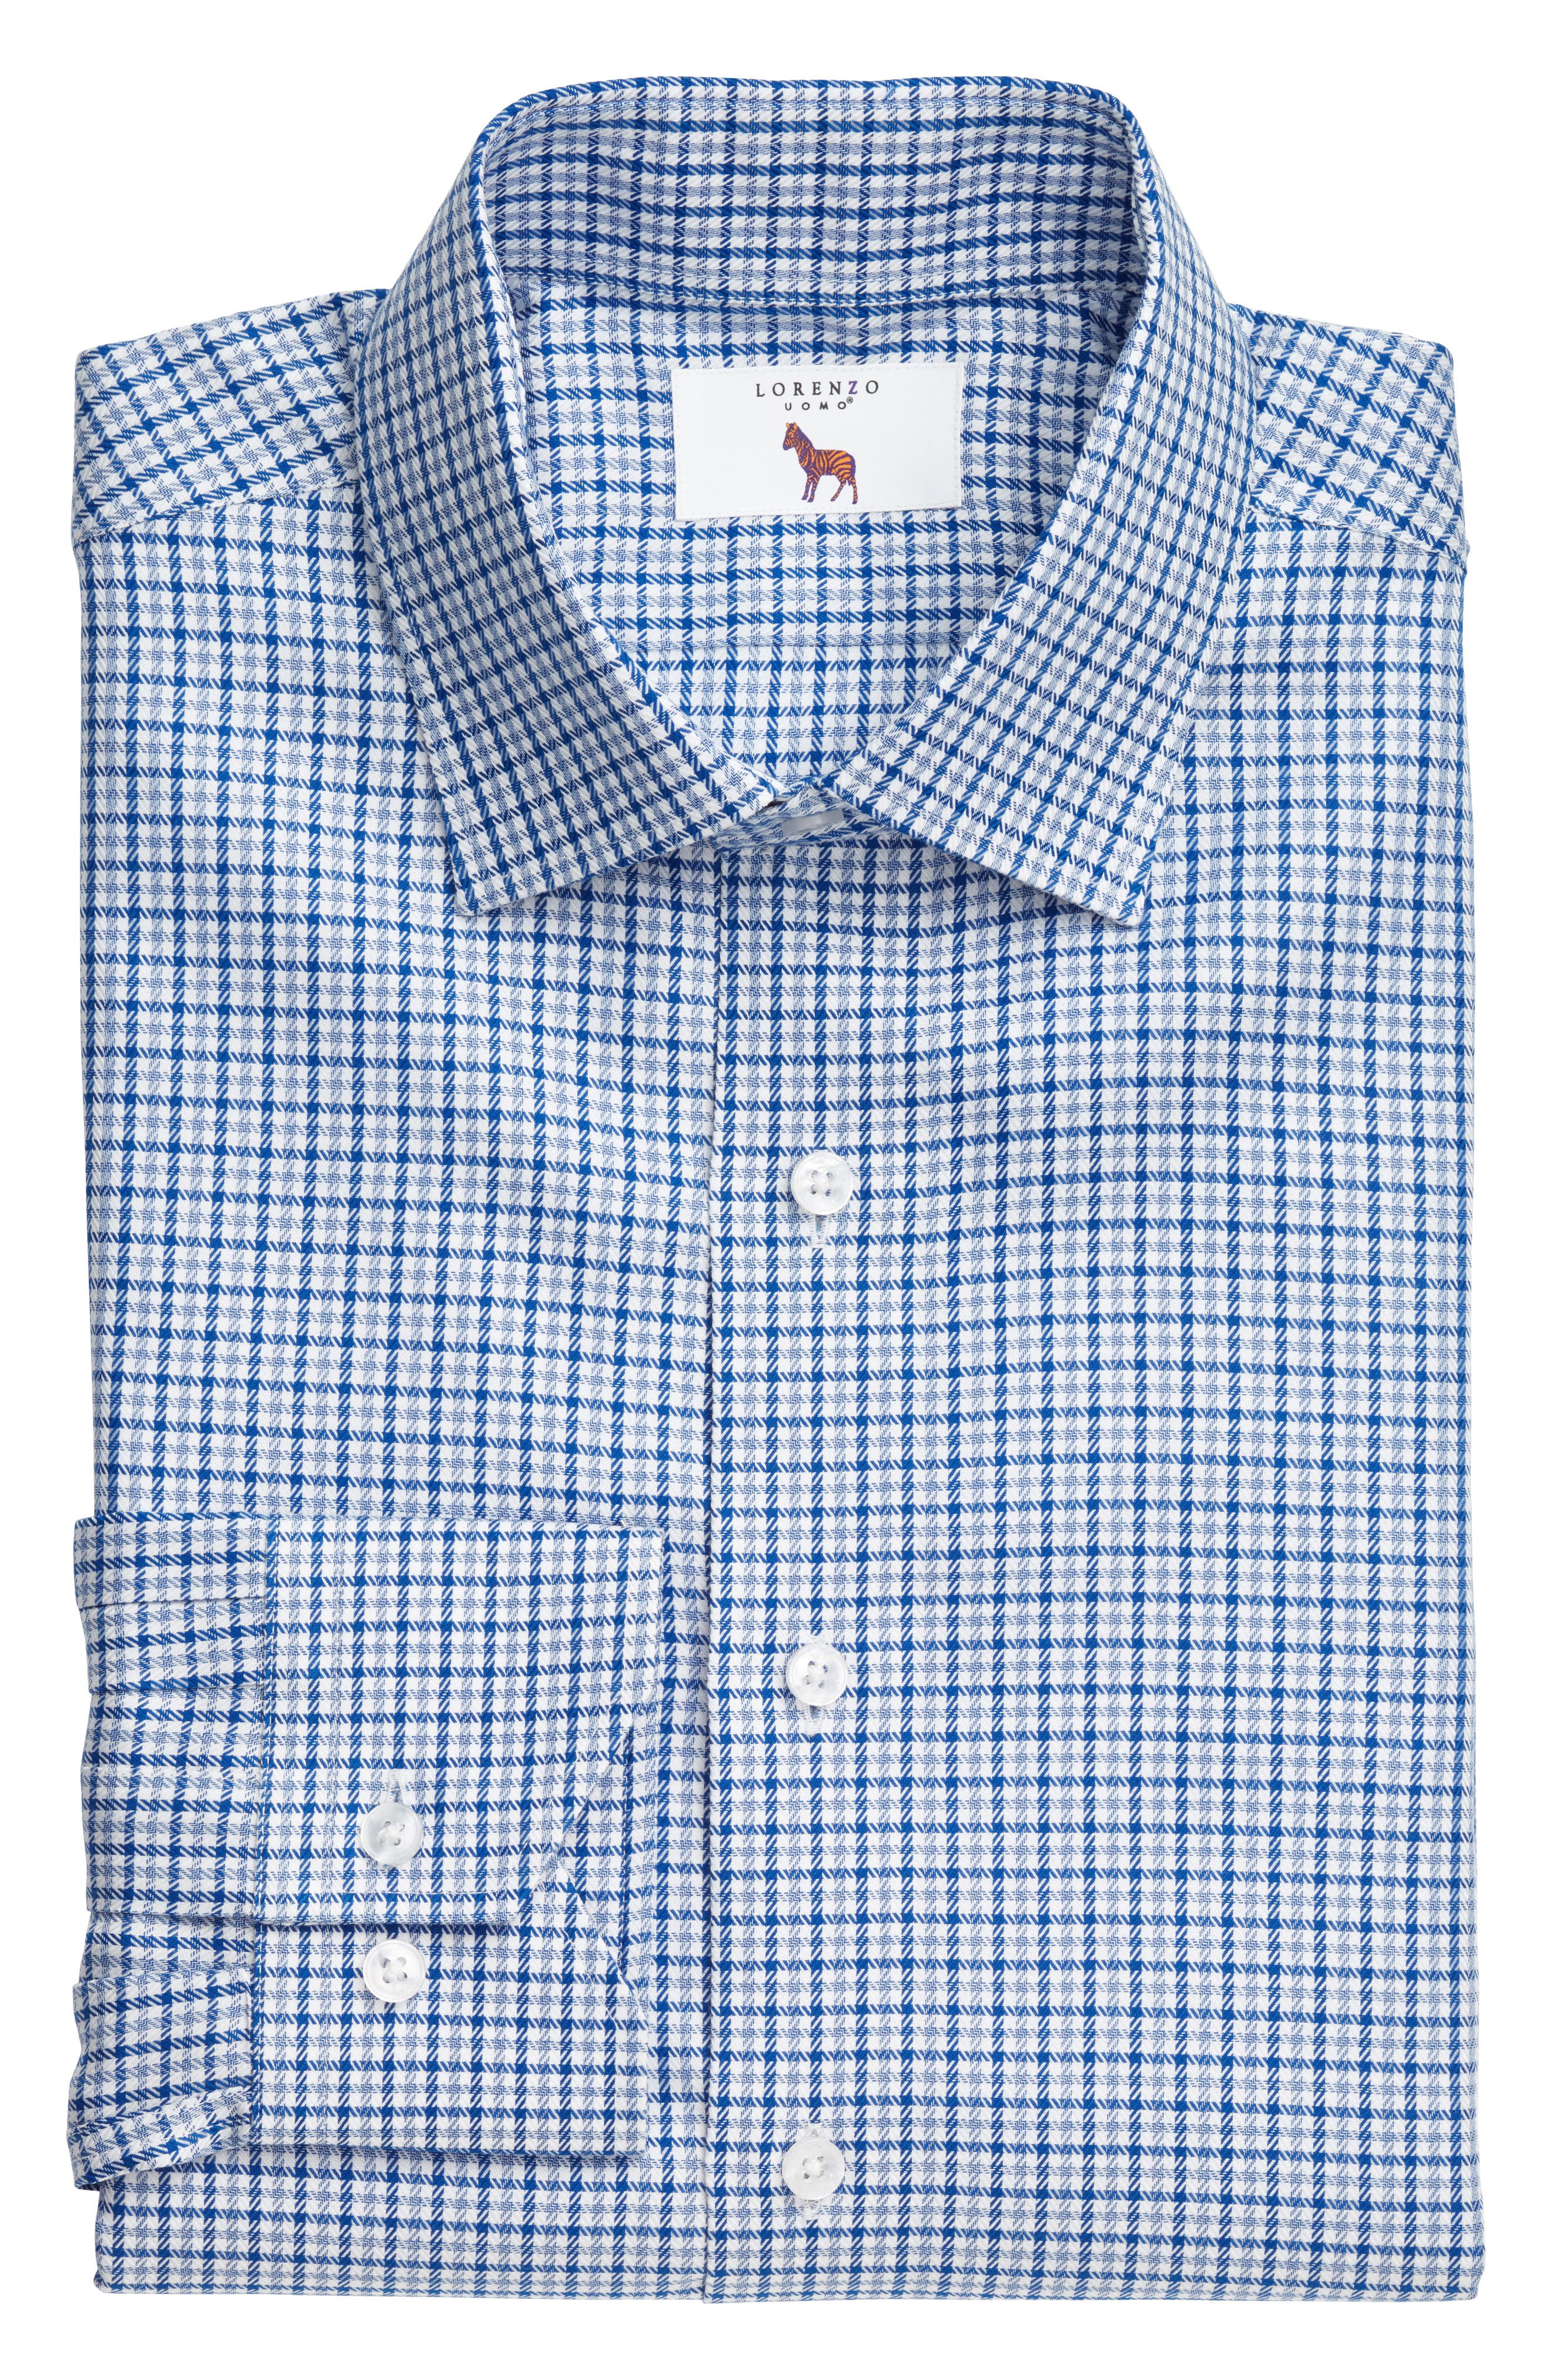 LORENZO UOMO,                             Trim Fit Textured Check Dress Shirt,                             Alternate thumbnail 3, color,                             410